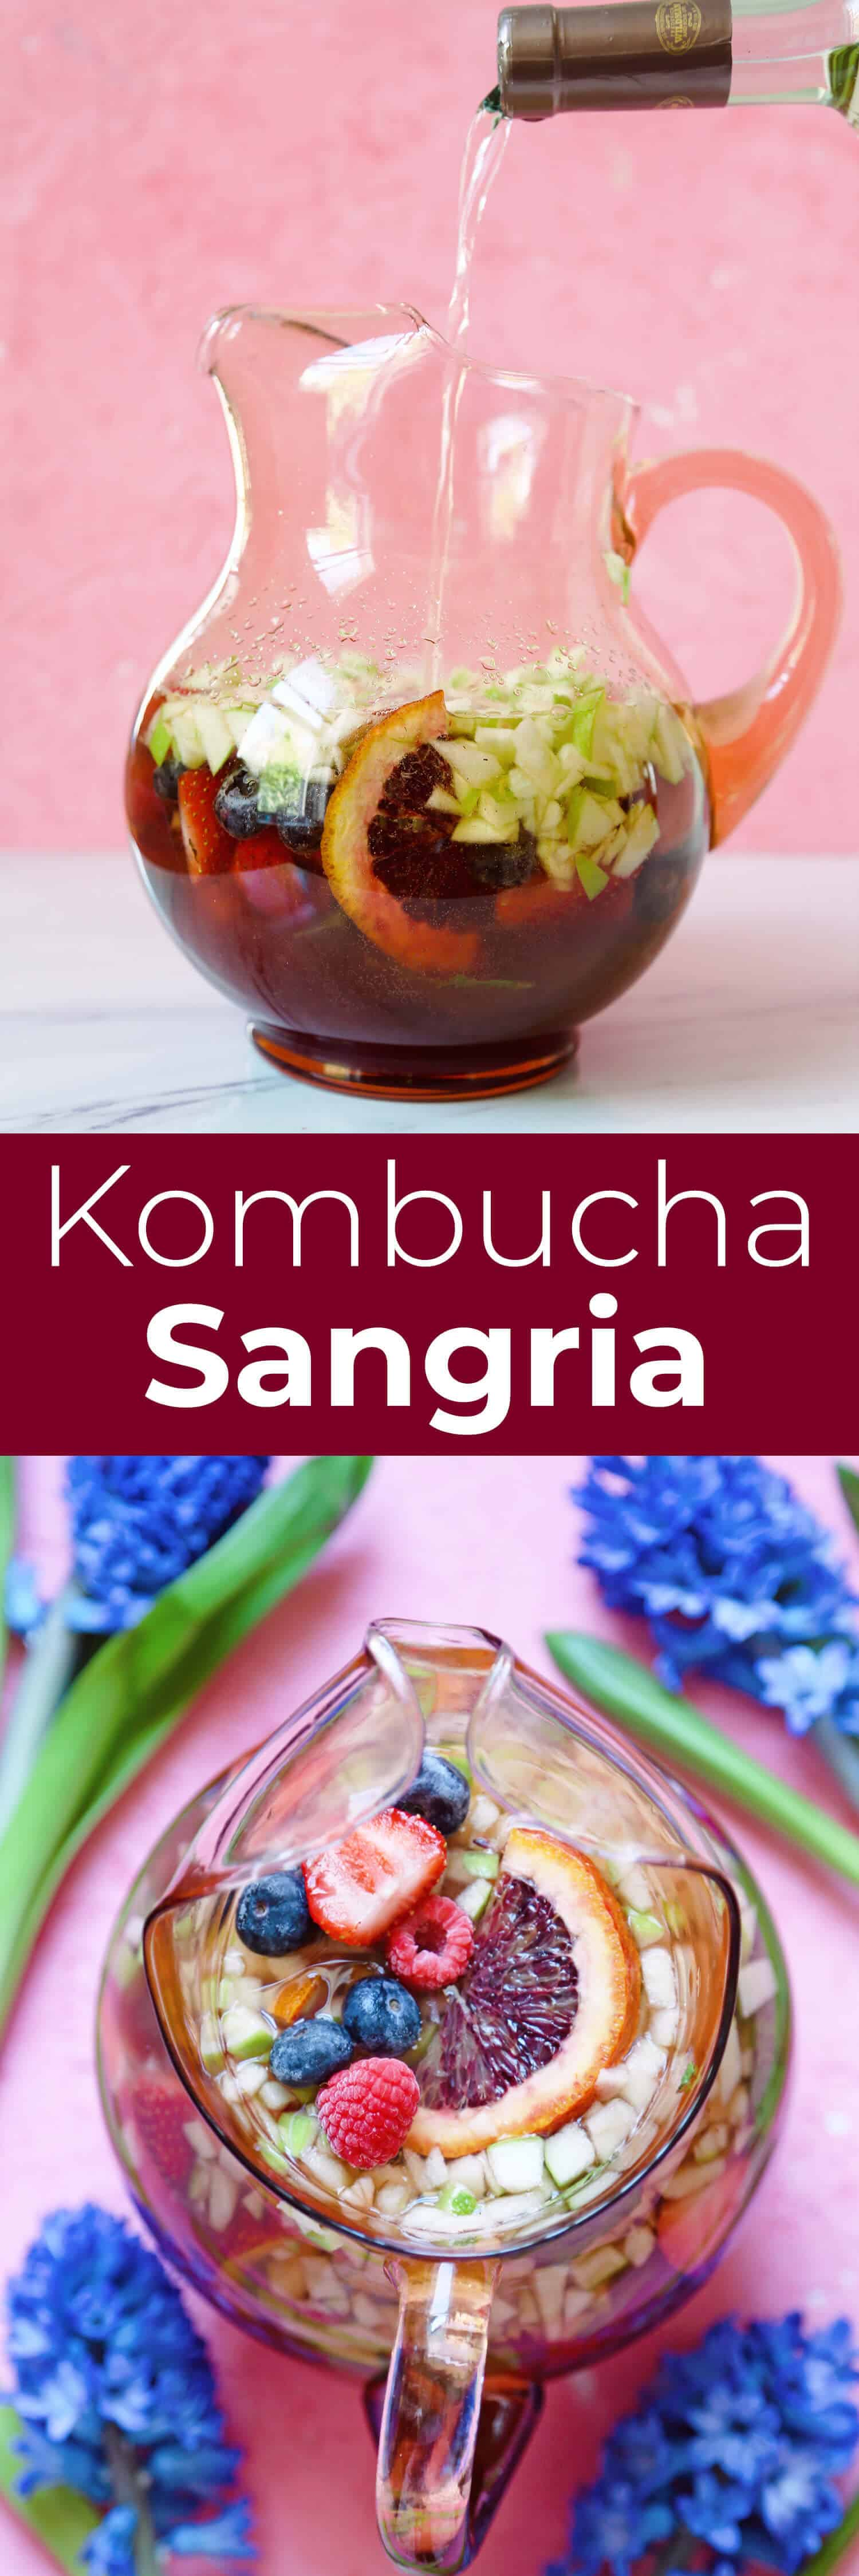 Kombucha Sangria